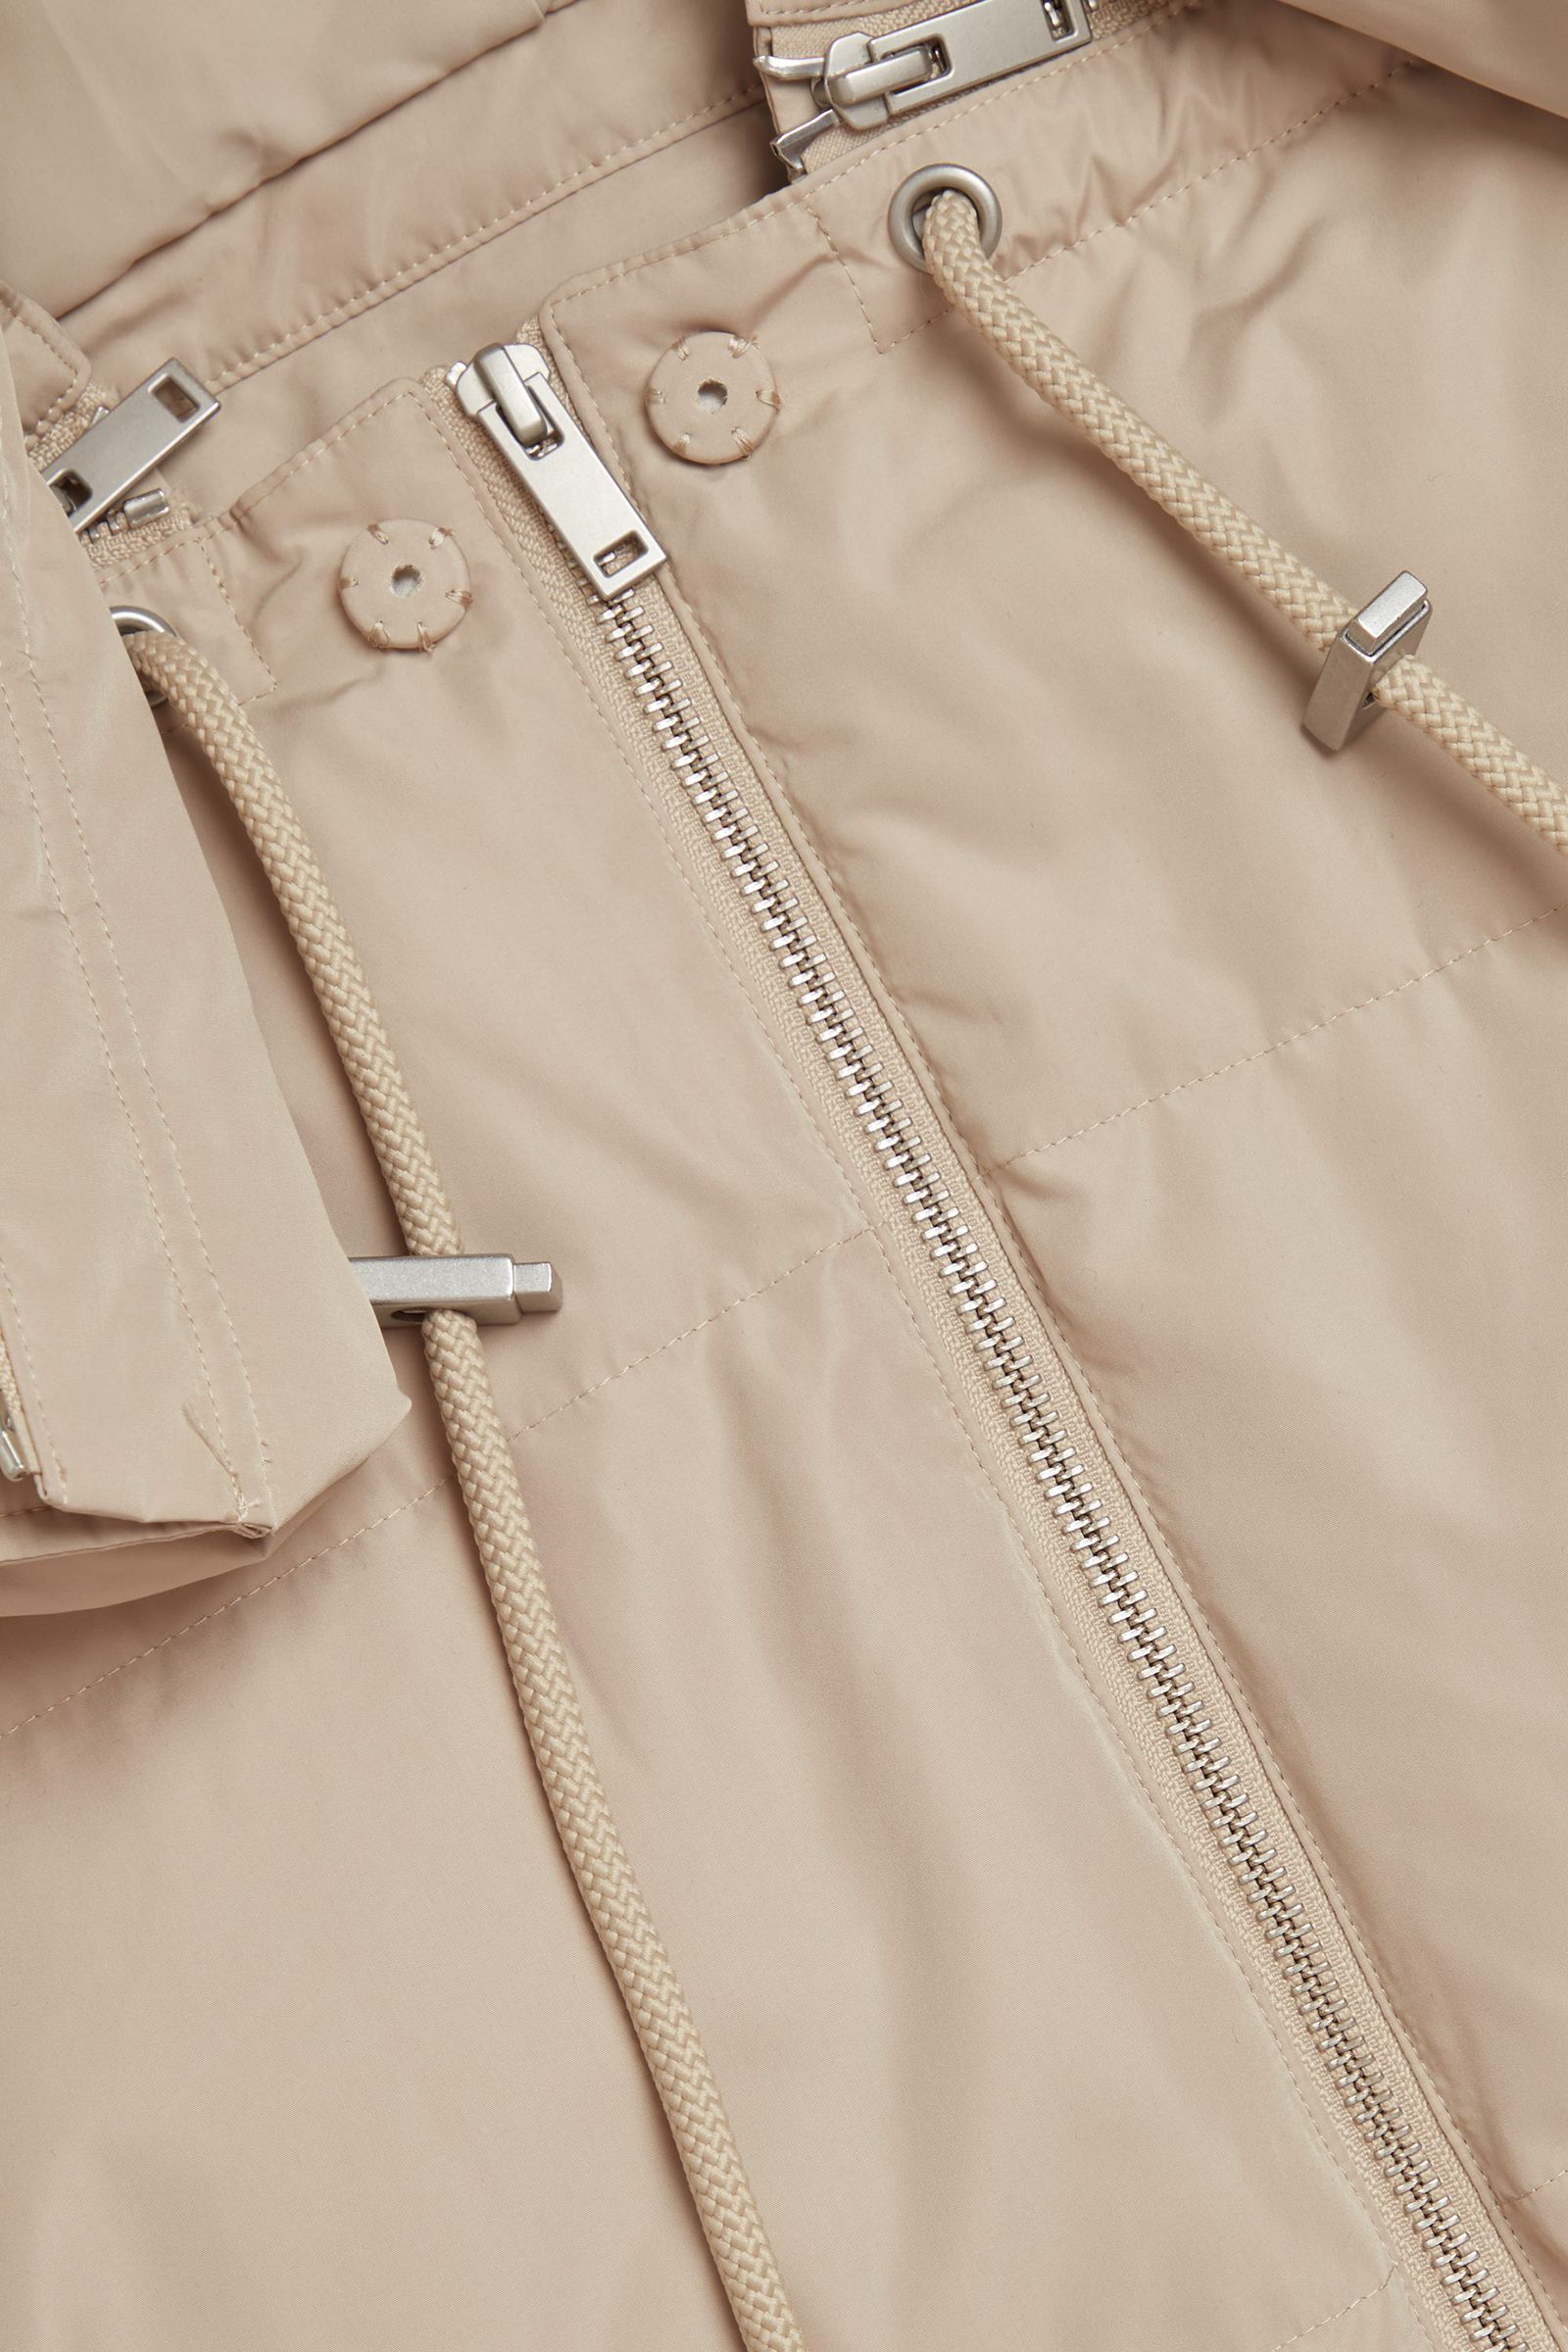 COS 3 in 1 하이브리드 푸퍼 재킷의 베이지컬러 Detail입니다.